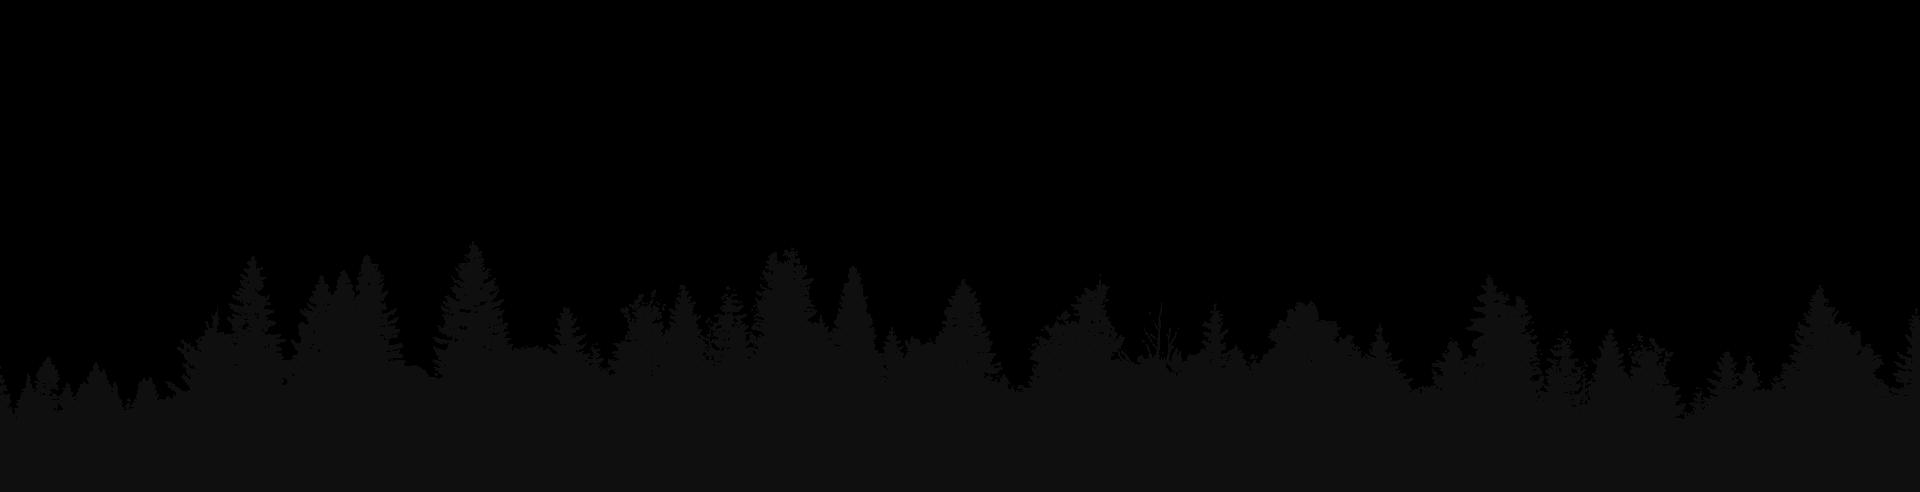 Black Silhouette Tree Line